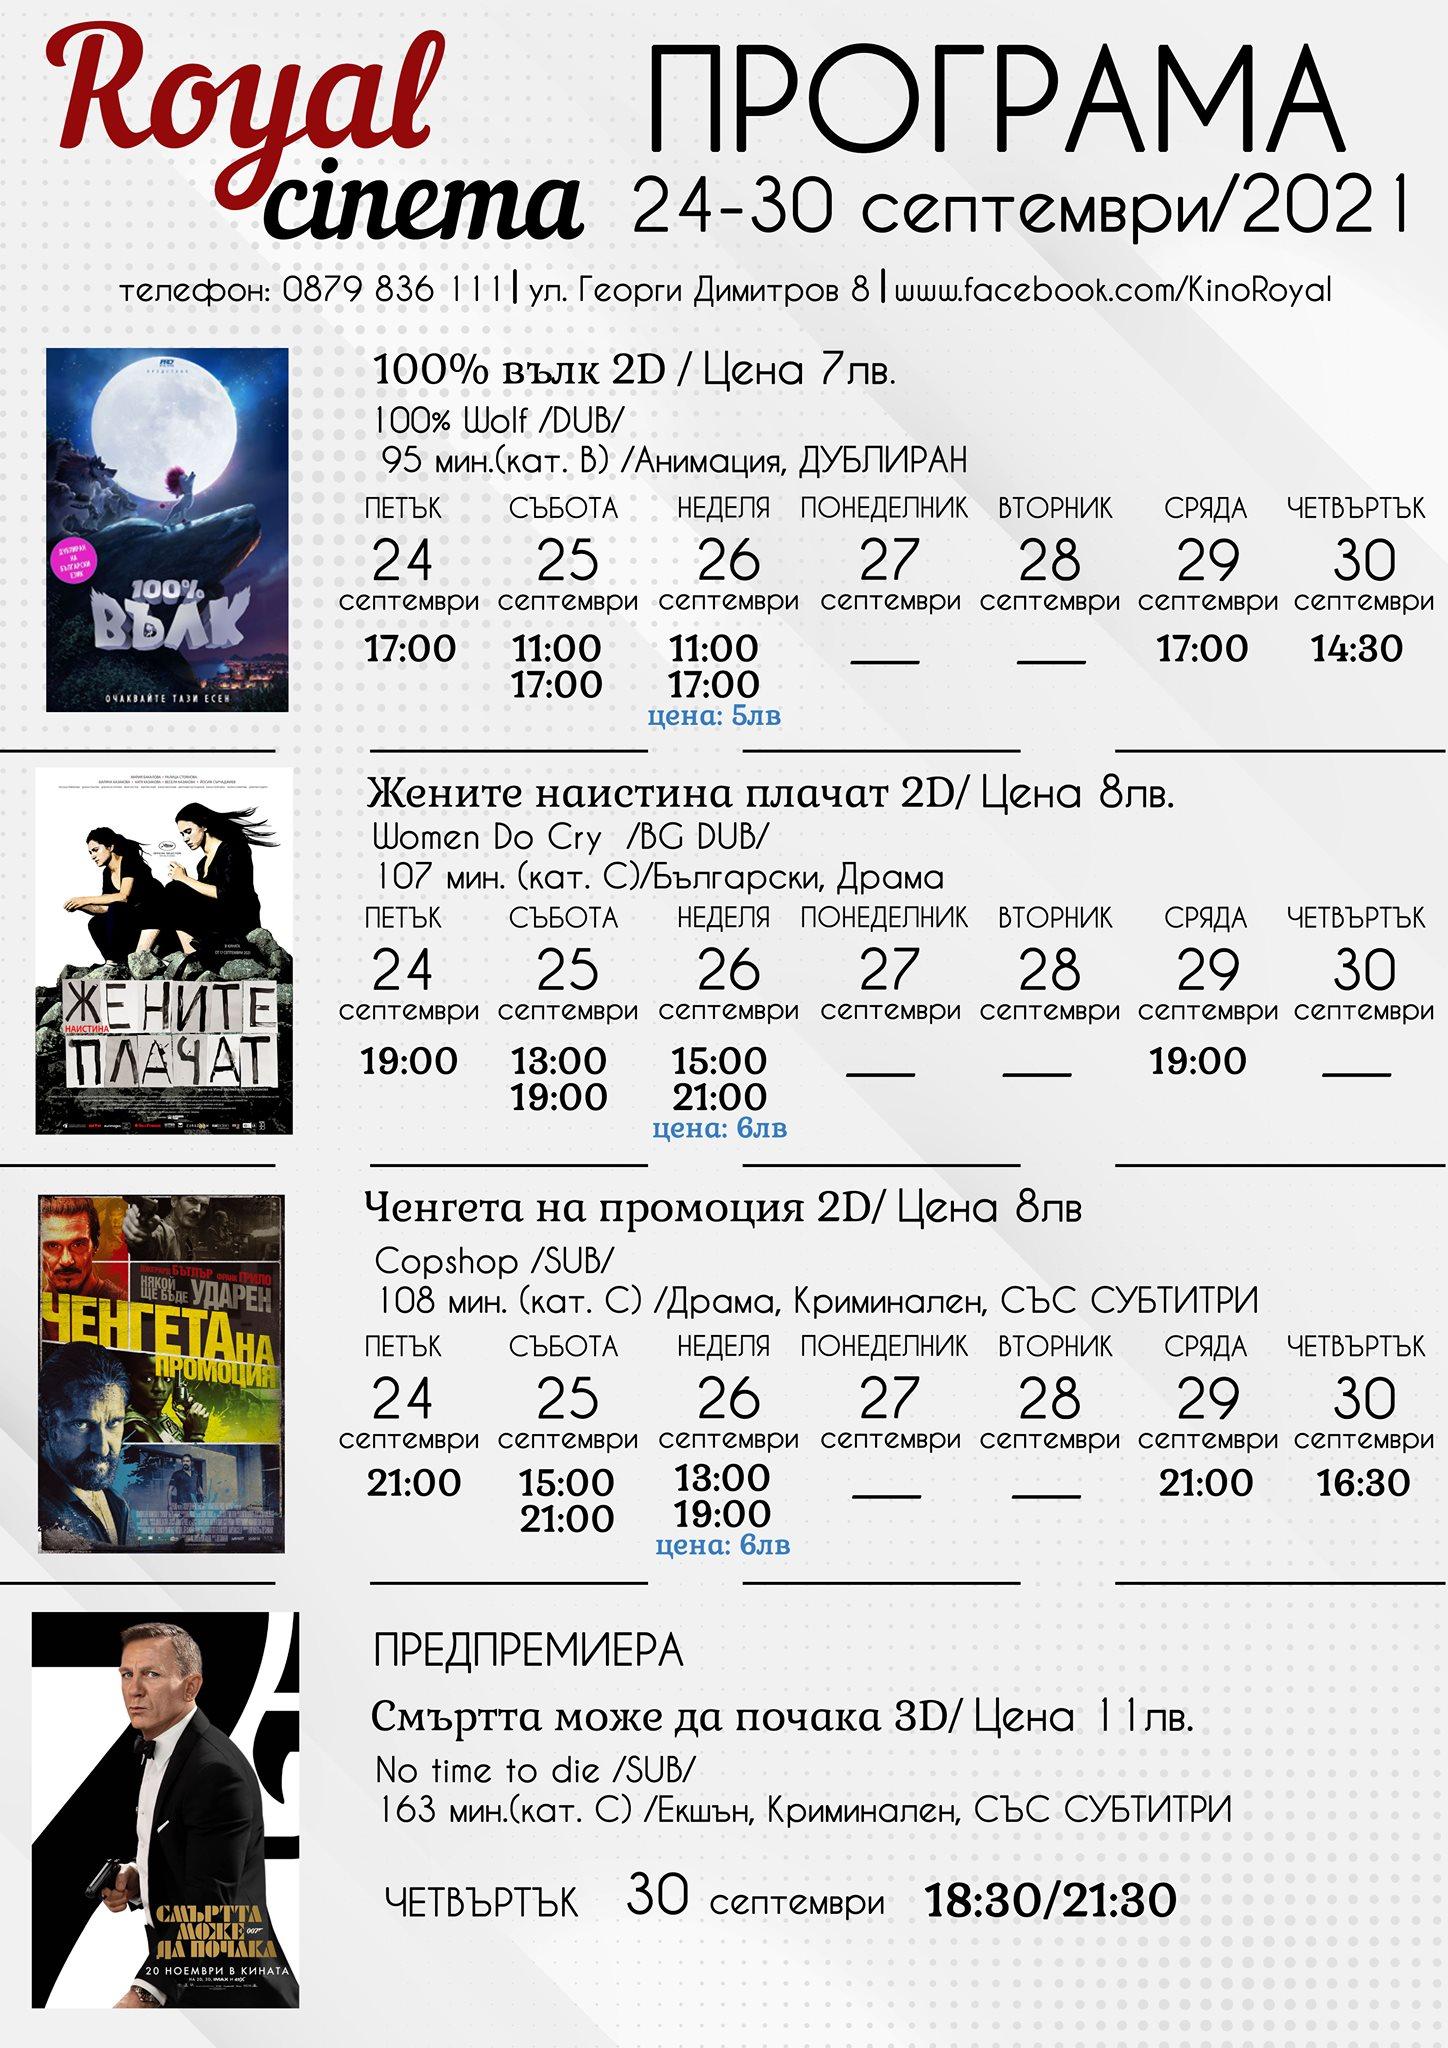 Кино Royal Мездра: Кино програма - 24-30 септември 2021